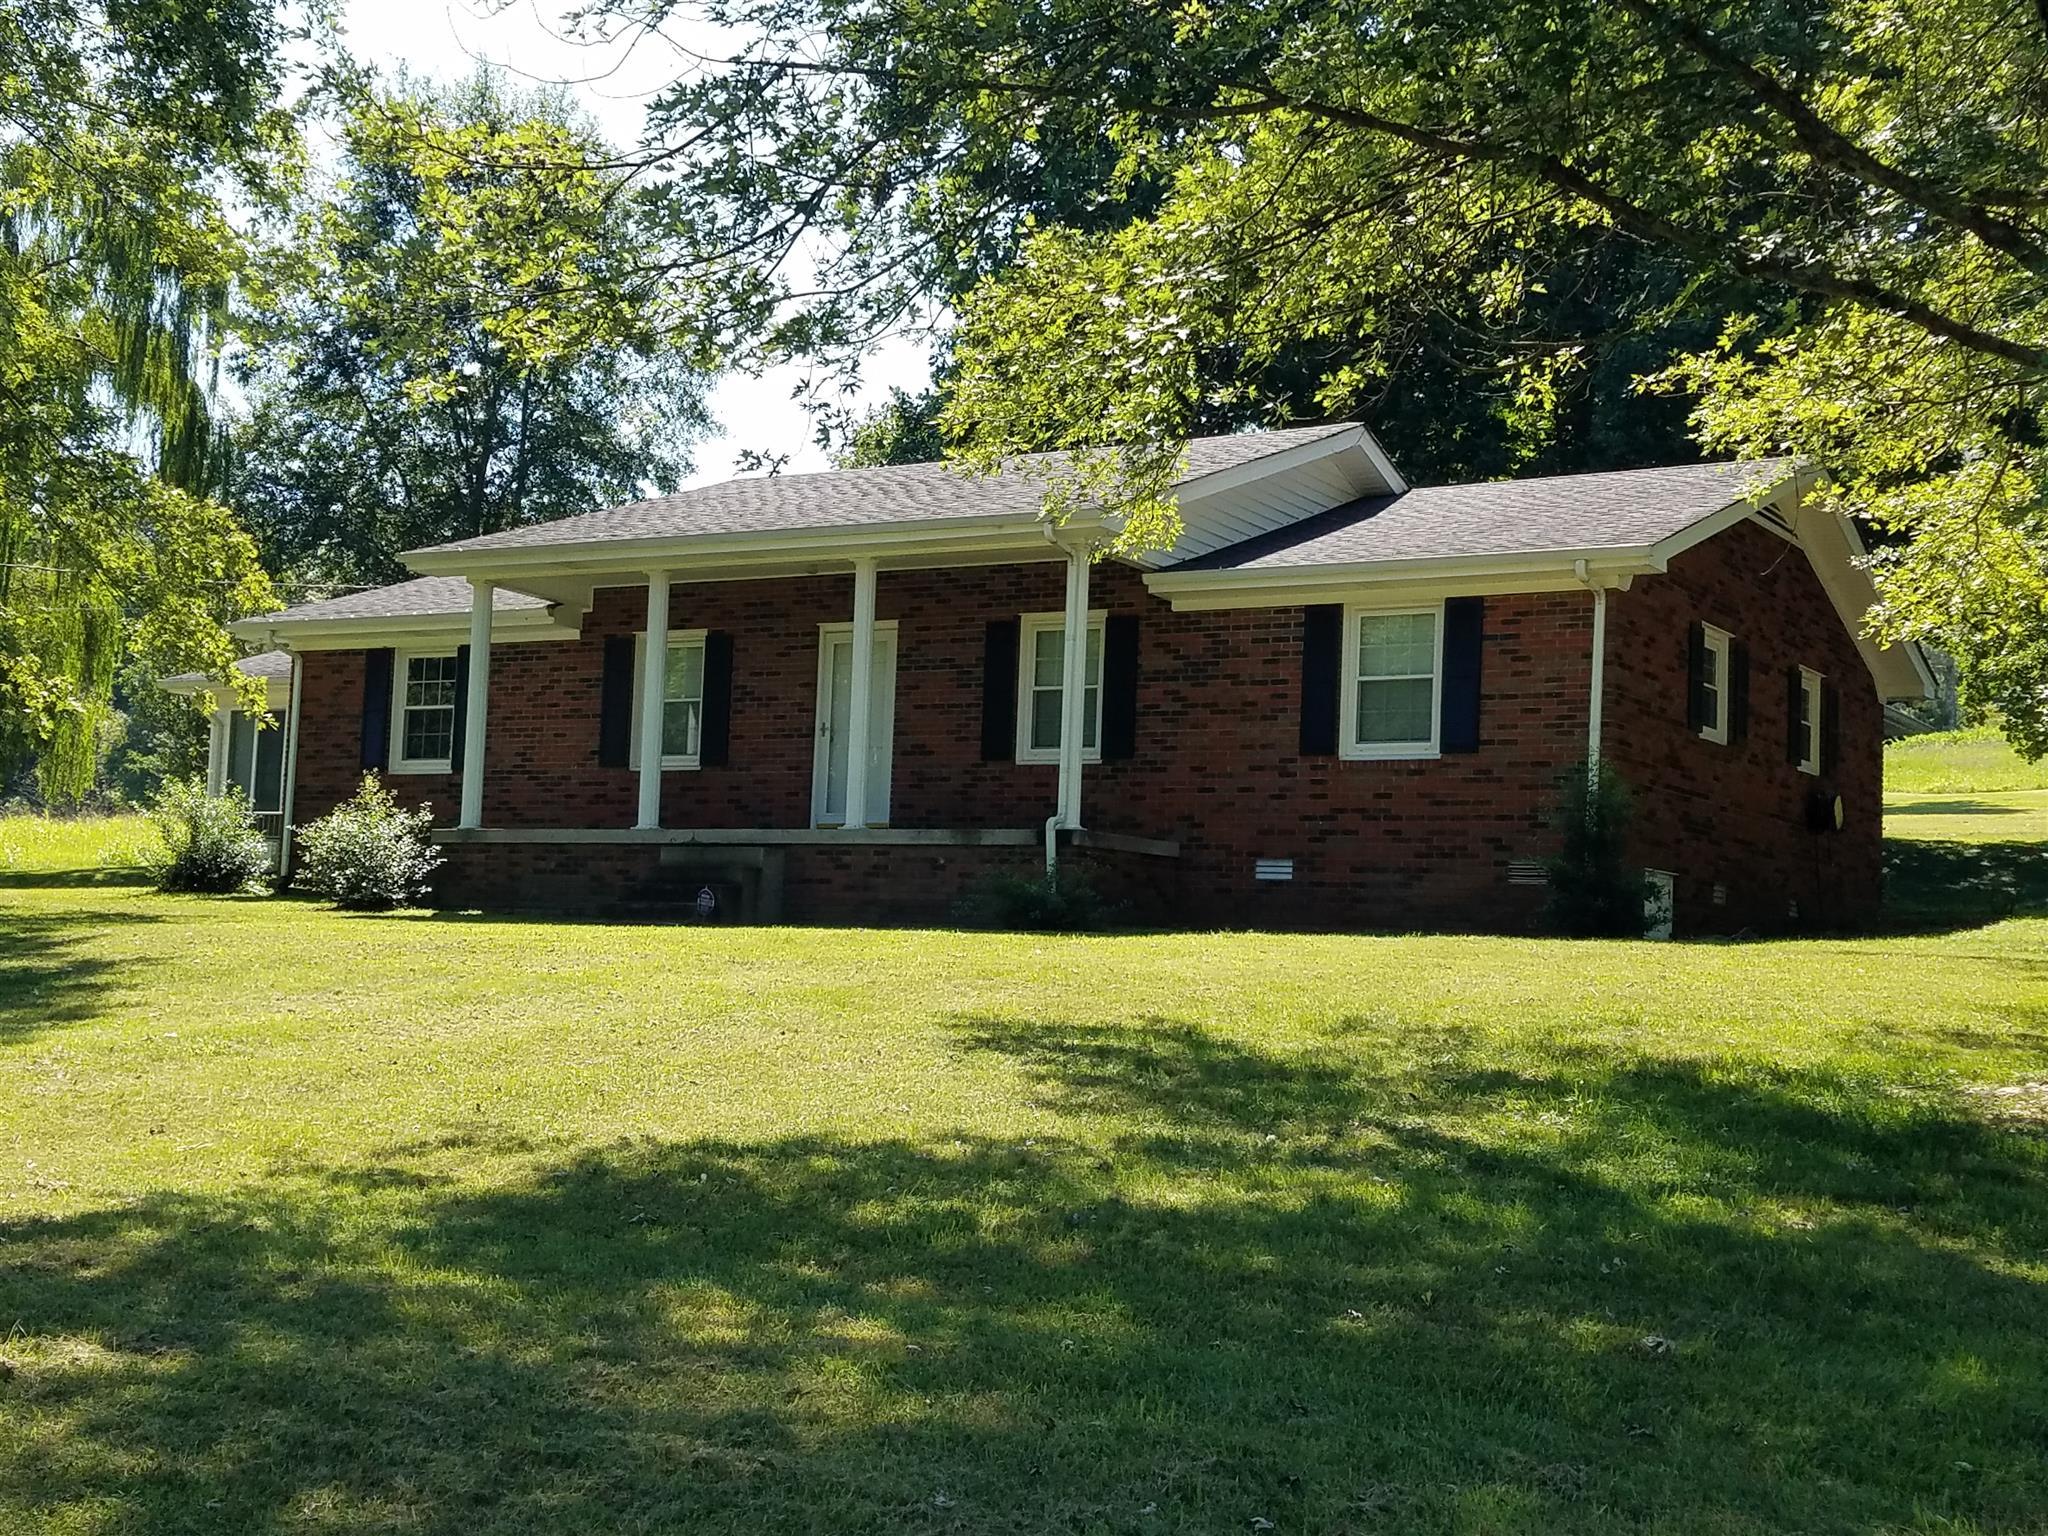 26 Beasley Hollow Ln, Carthage, TN 37030 - Carthage, TN real estate listing